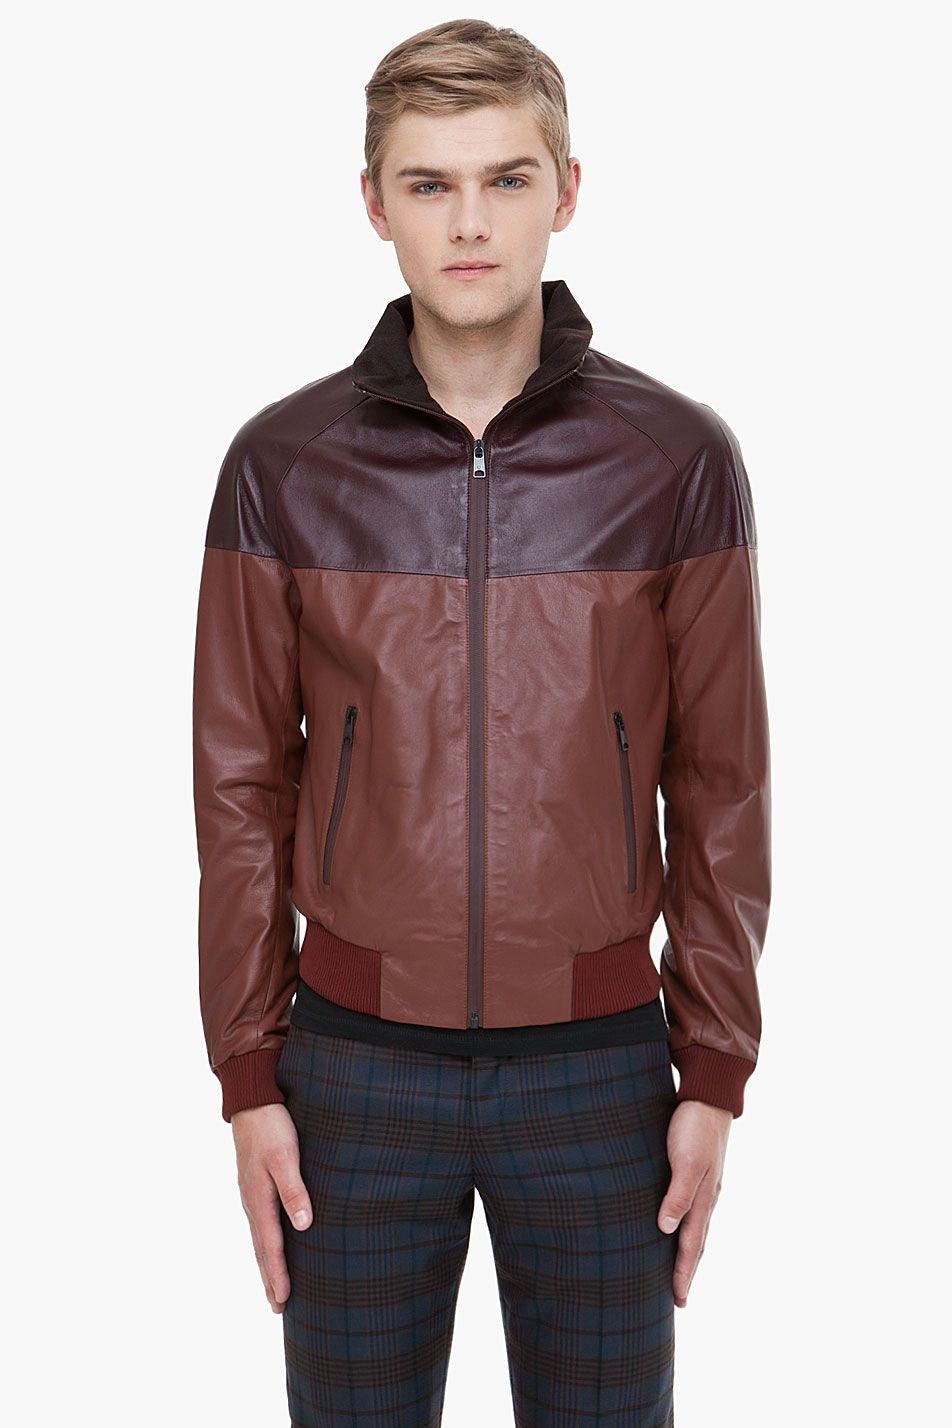 ALEXANDER MCQUEEN Dual Brown Leather Jacket